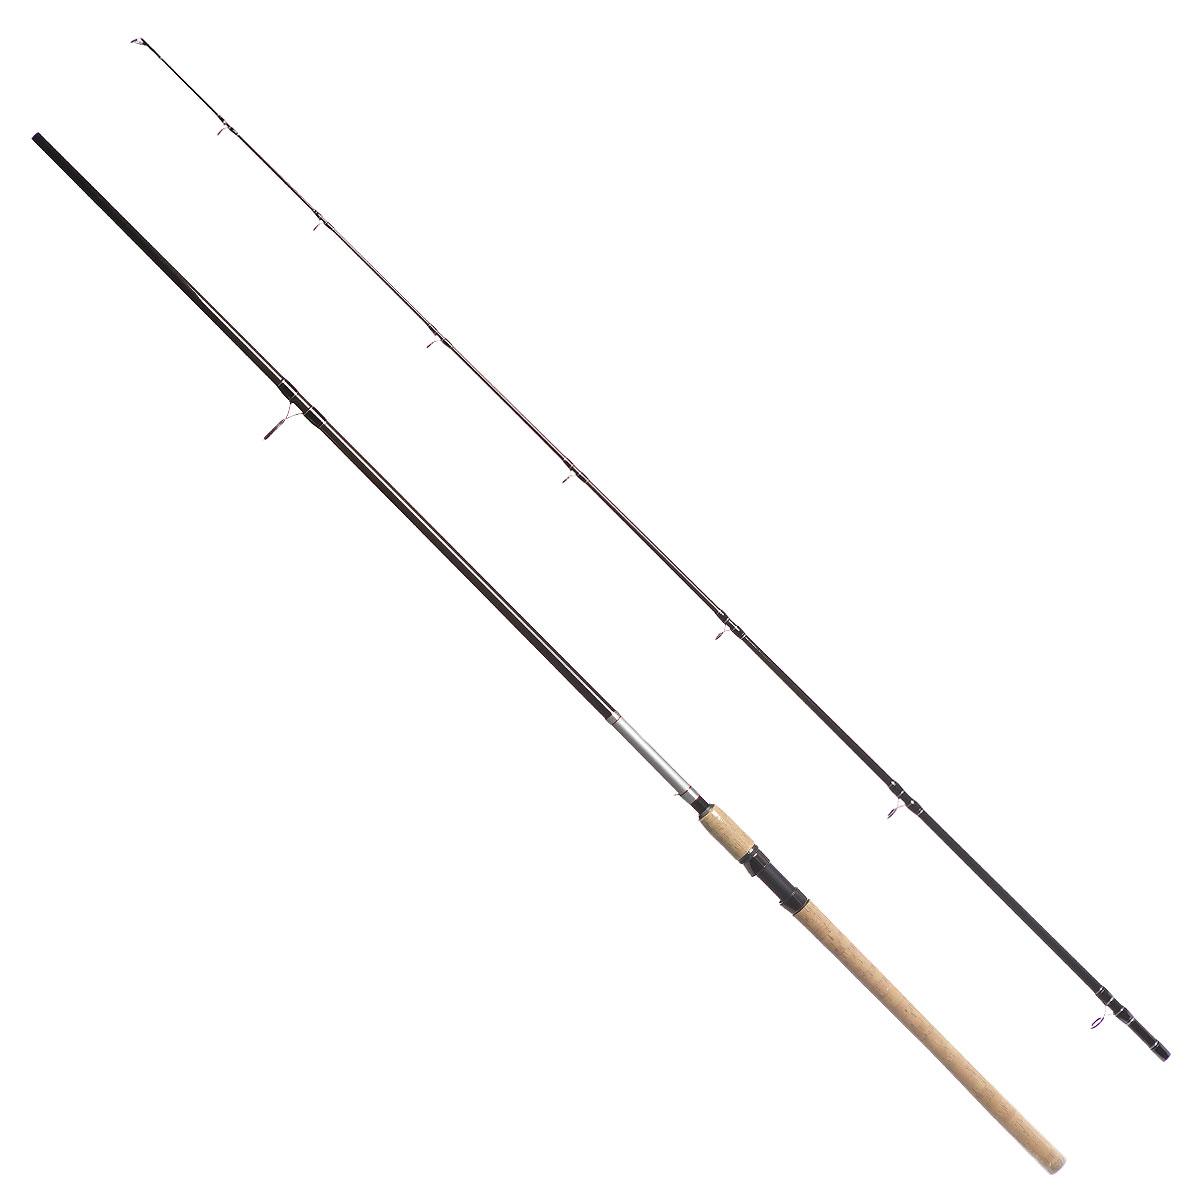 Удилище спиннинговое Daiwa Sweepfire NEW, штекерное, 3 м, 20-60 г